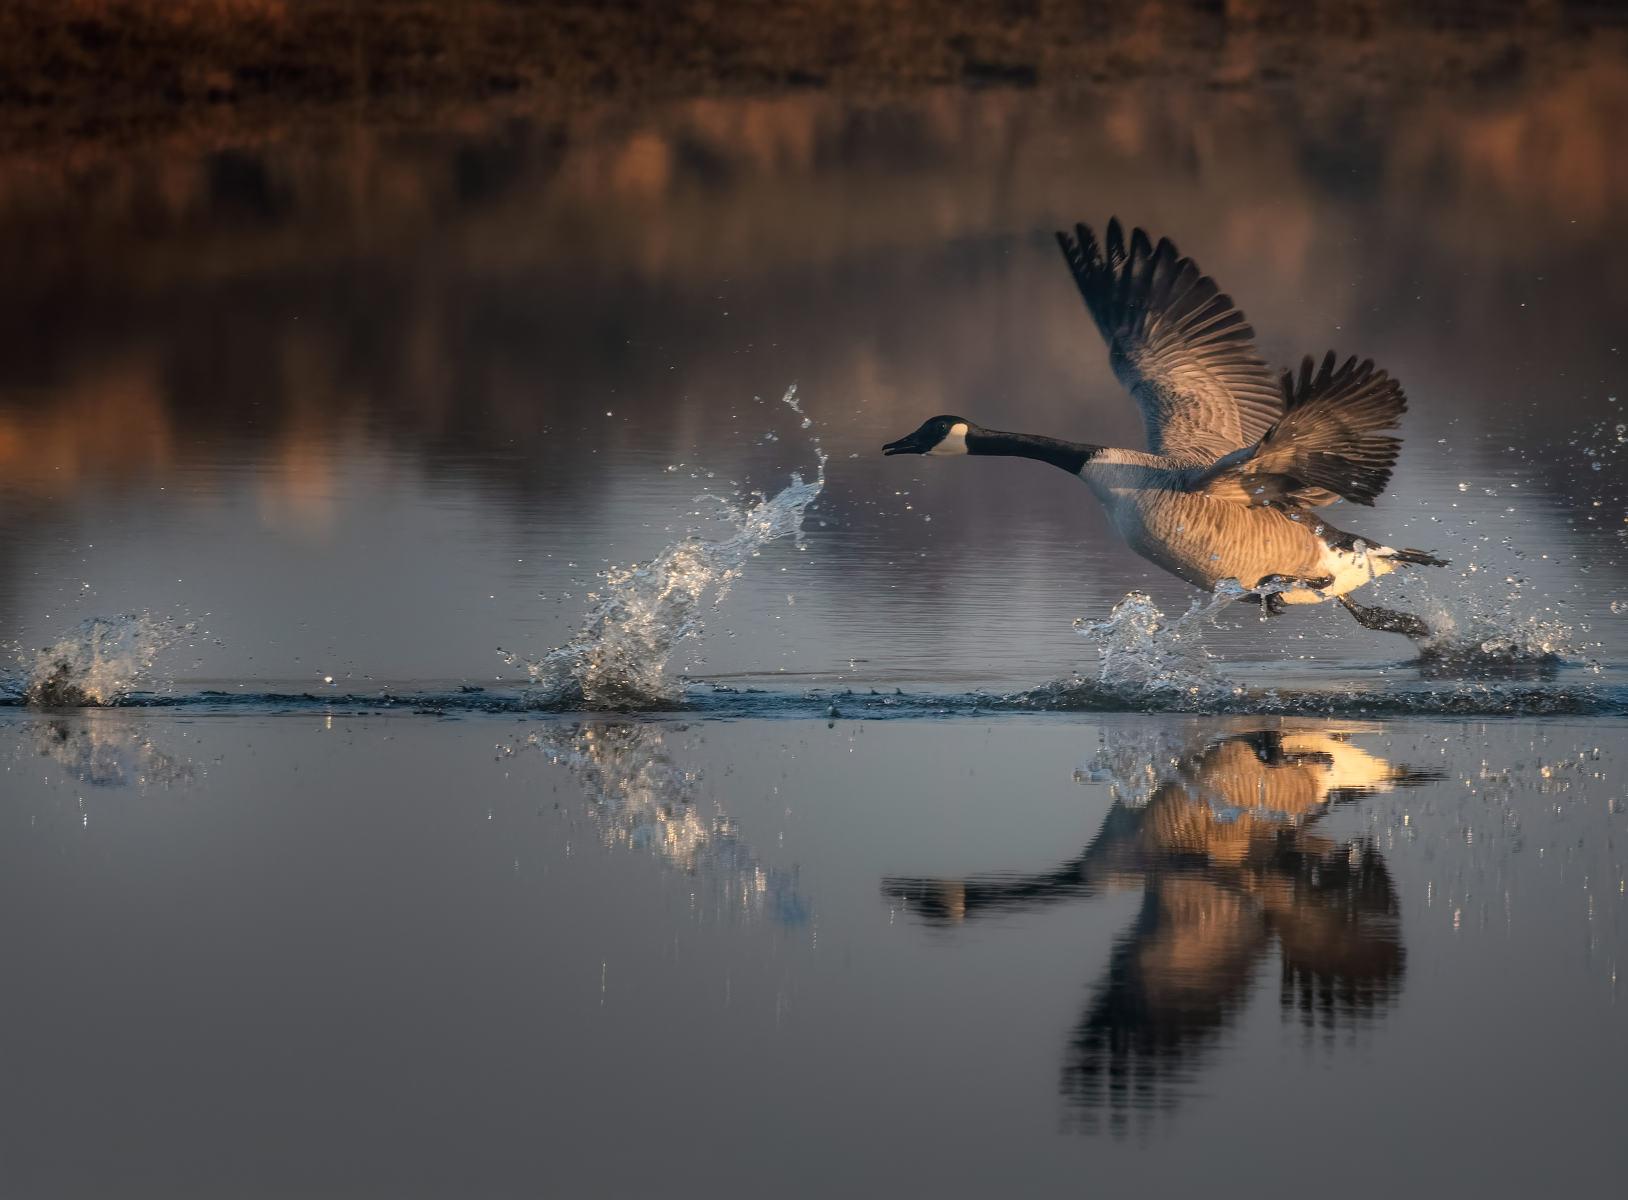 canada goose taking flight through the splashes of its partner